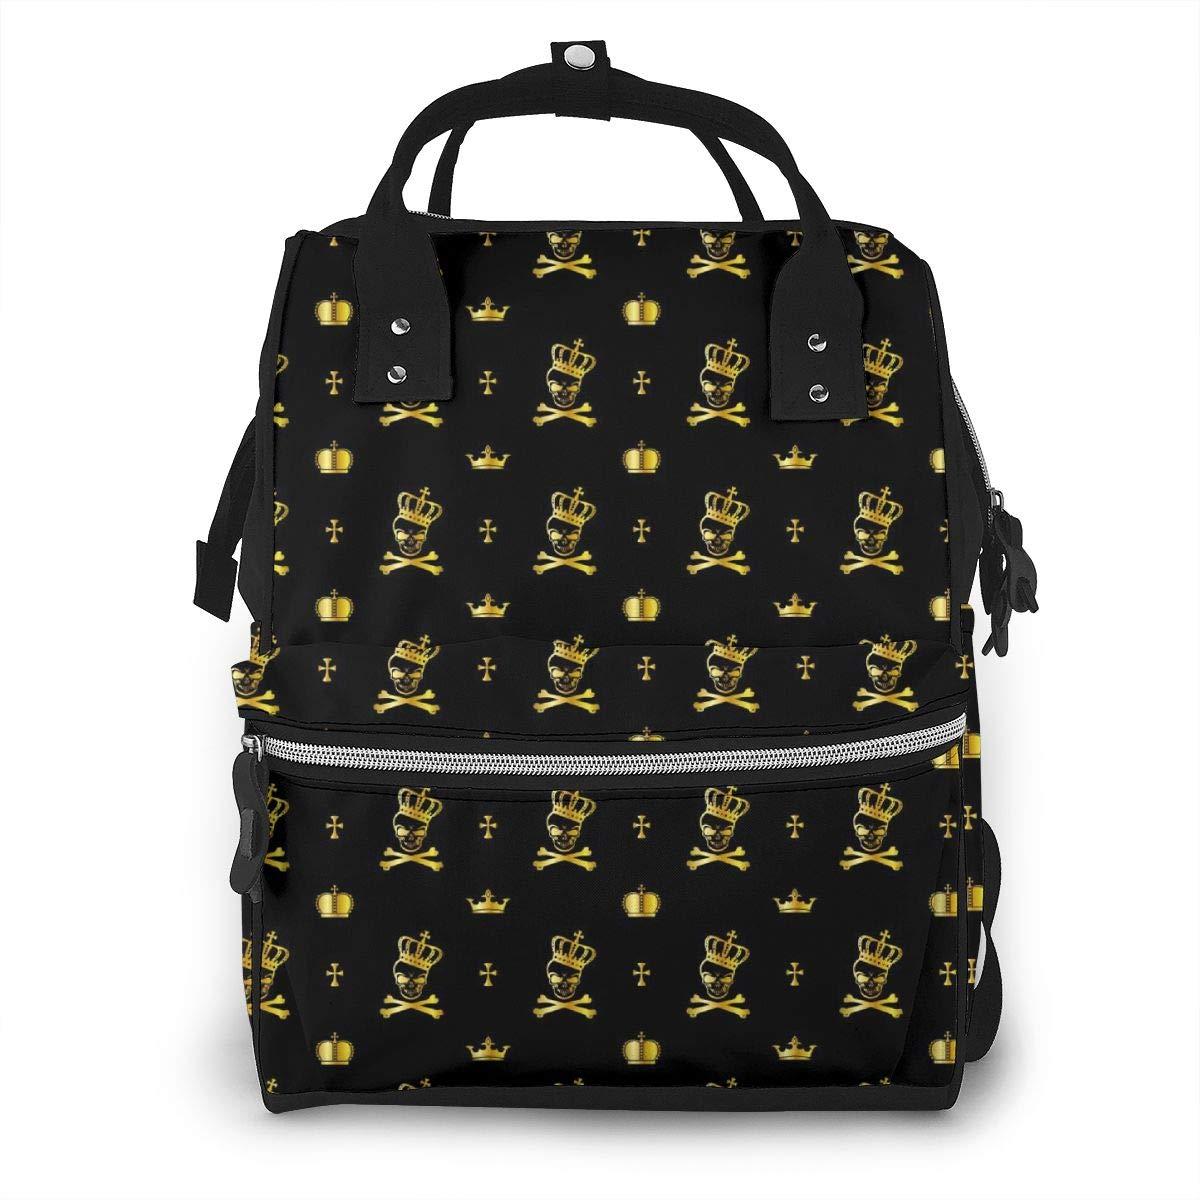 Crown Bone Large Capacity Diaper Nappy Travel Nursing Bag Mummy Mom Backpack Laptop Multi-Function for Baby Care Women Family